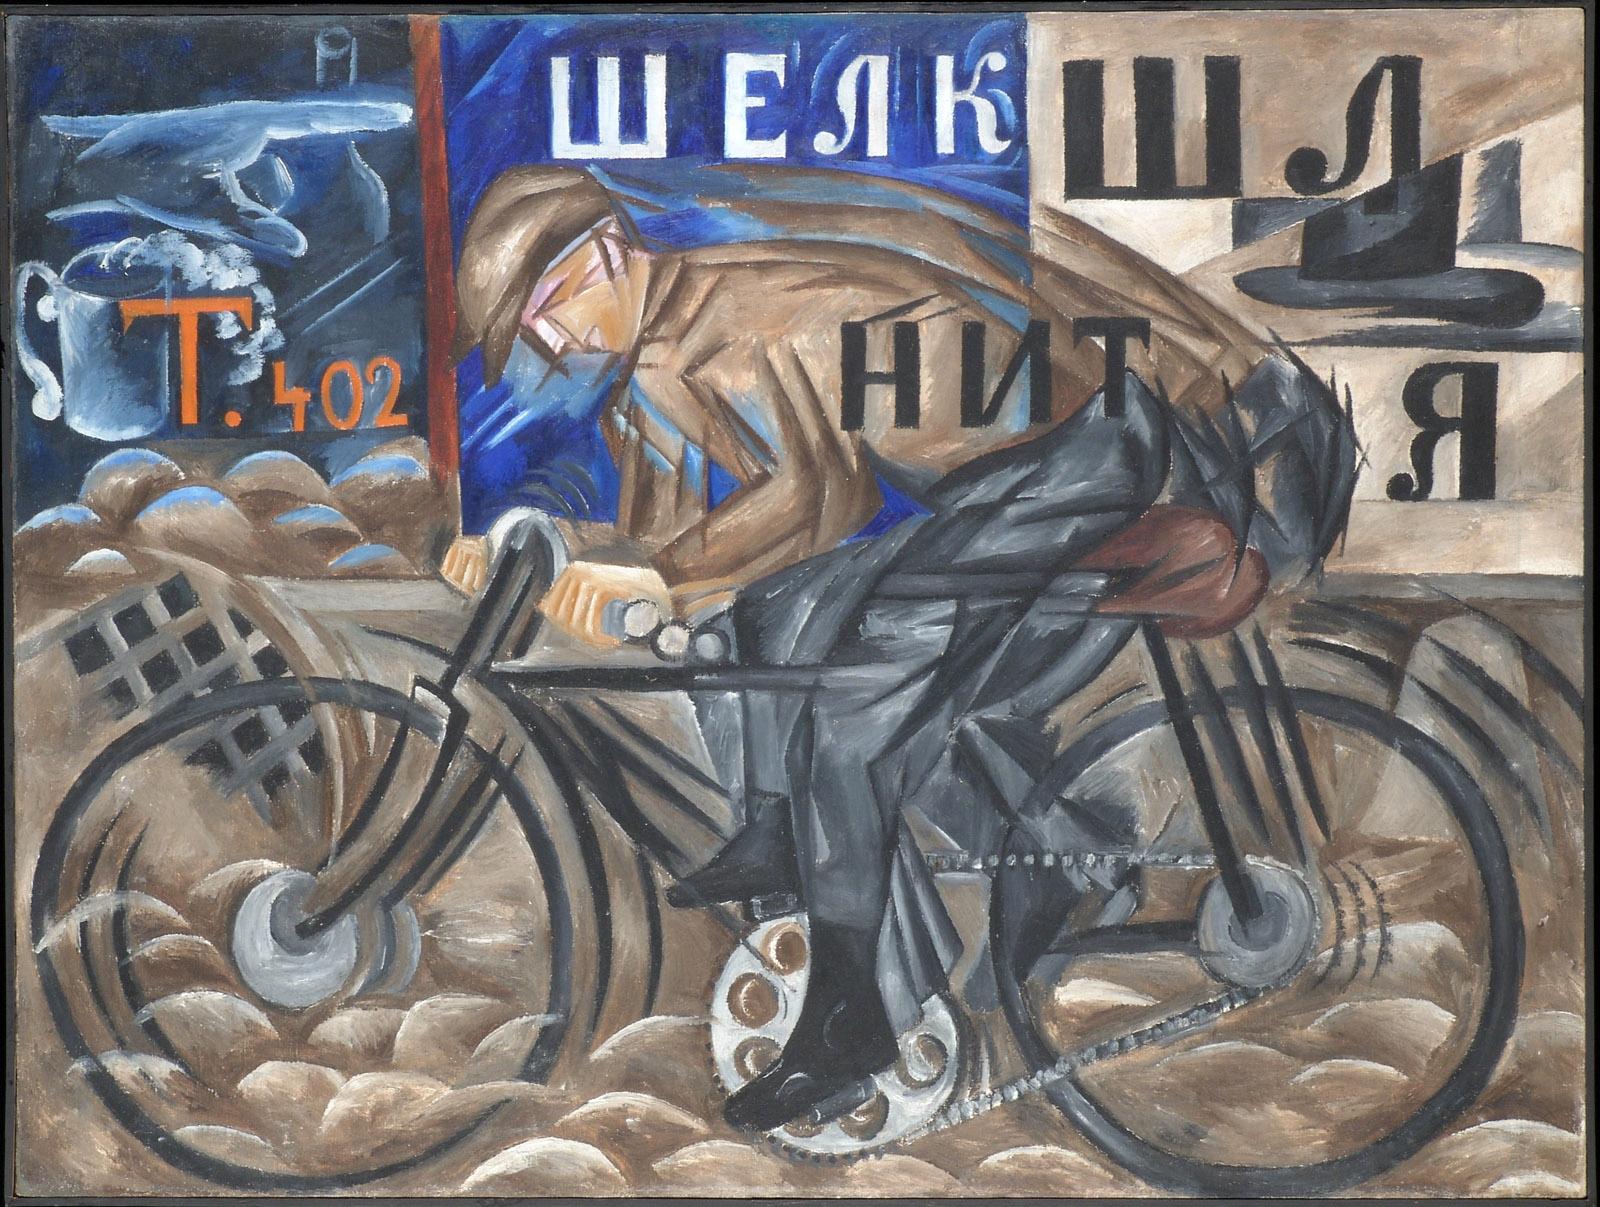 Natalia Goncharova, Ciclista, 1913 (olio su tela, 79x105 cm.), © Nathalie Gontcharova by SIAE 2017